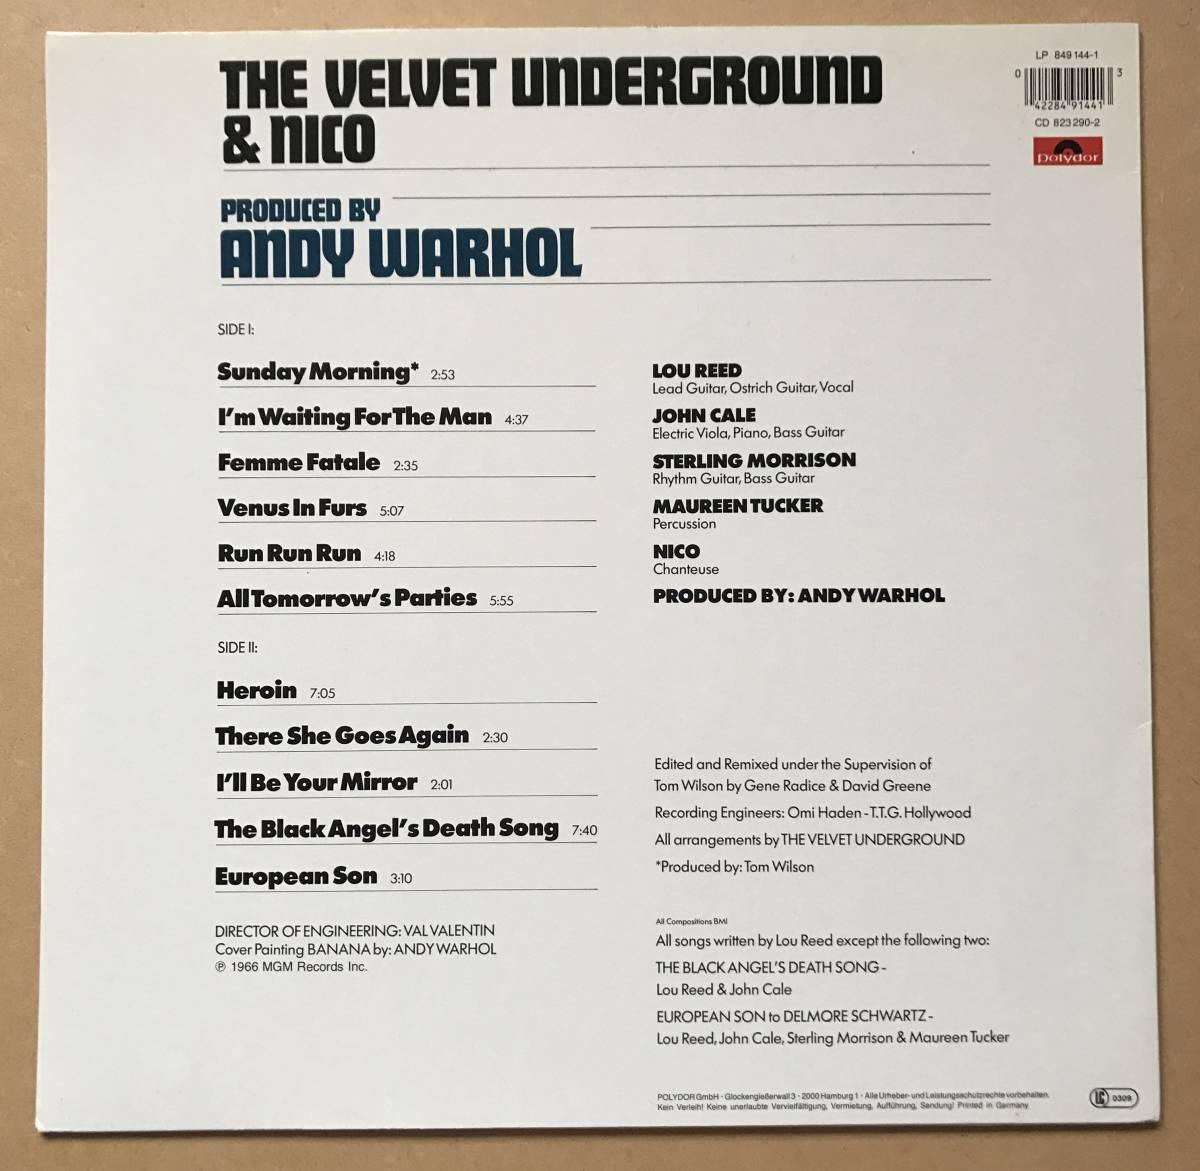 THE VELVET UNDERGROUND & NICO / ヴェルヴェット・アンダーグラウンド ANDY WARHOL 849 144-1_画像2